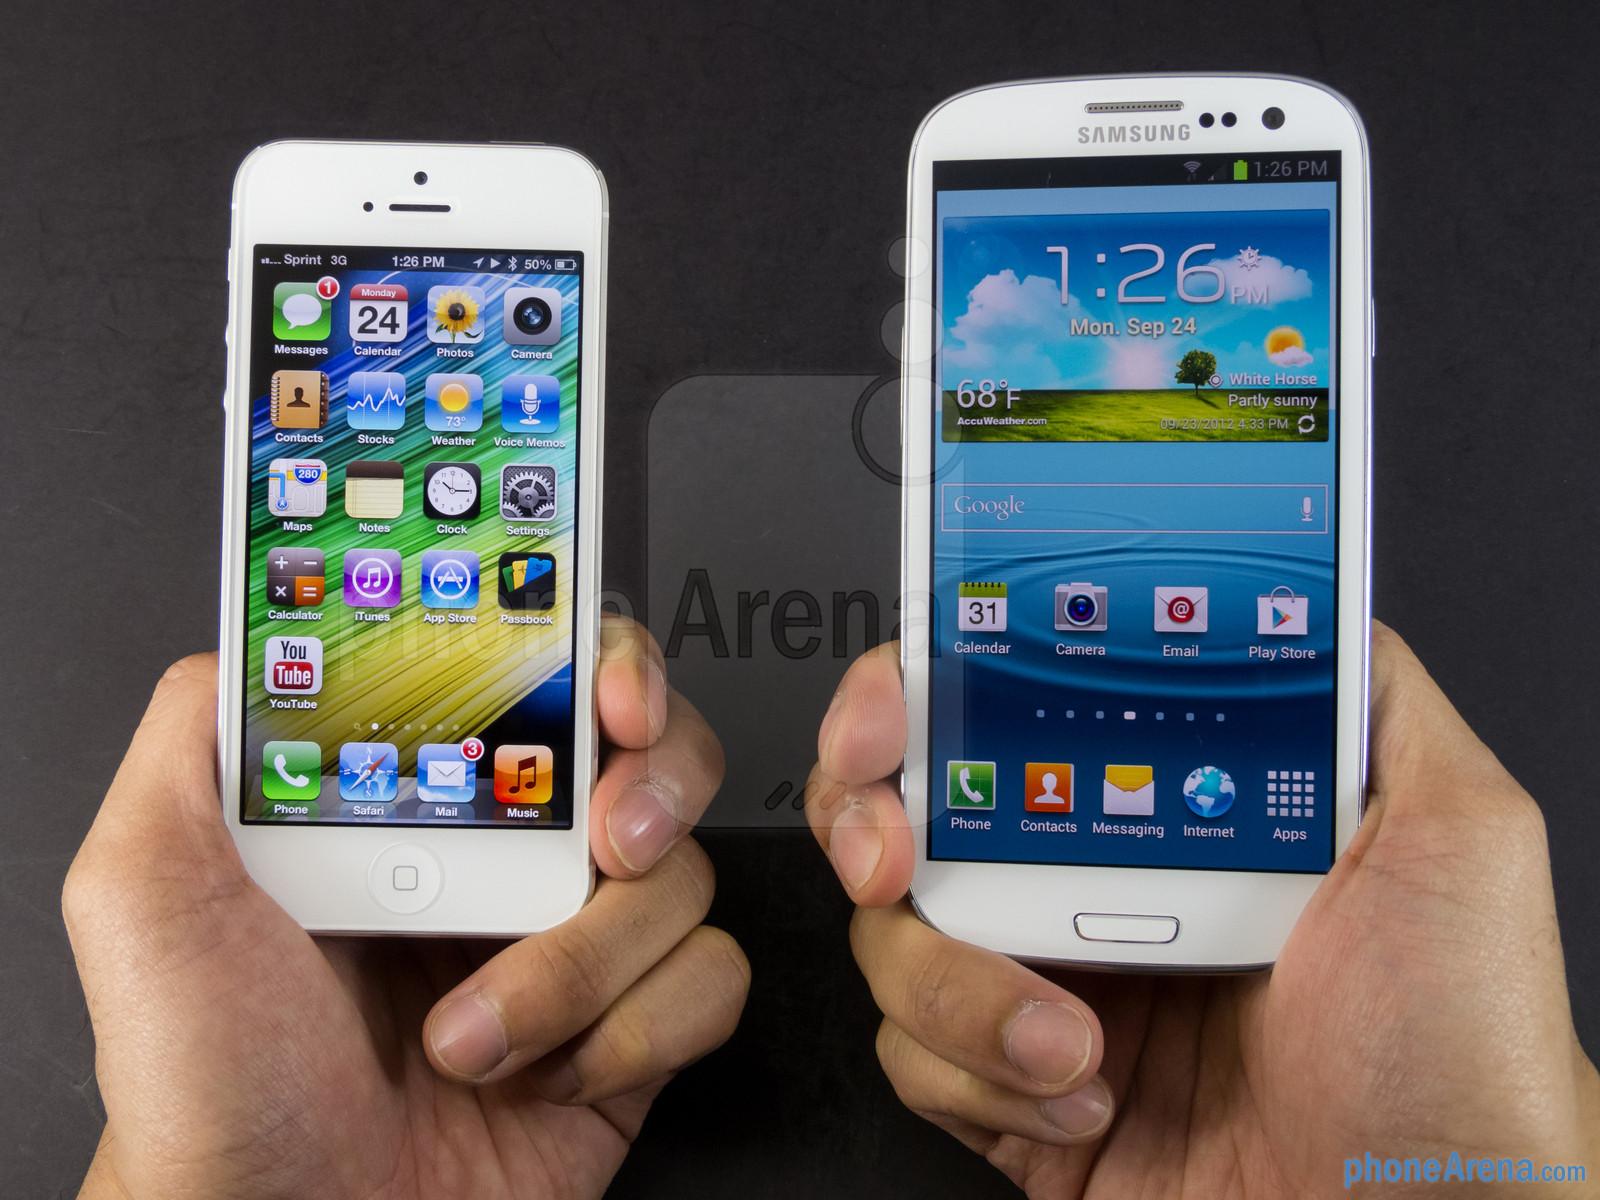 Daftar Harga Hp Samsung Tipe Hp Samsung Harga Baru Harga Bekas Samsung ...